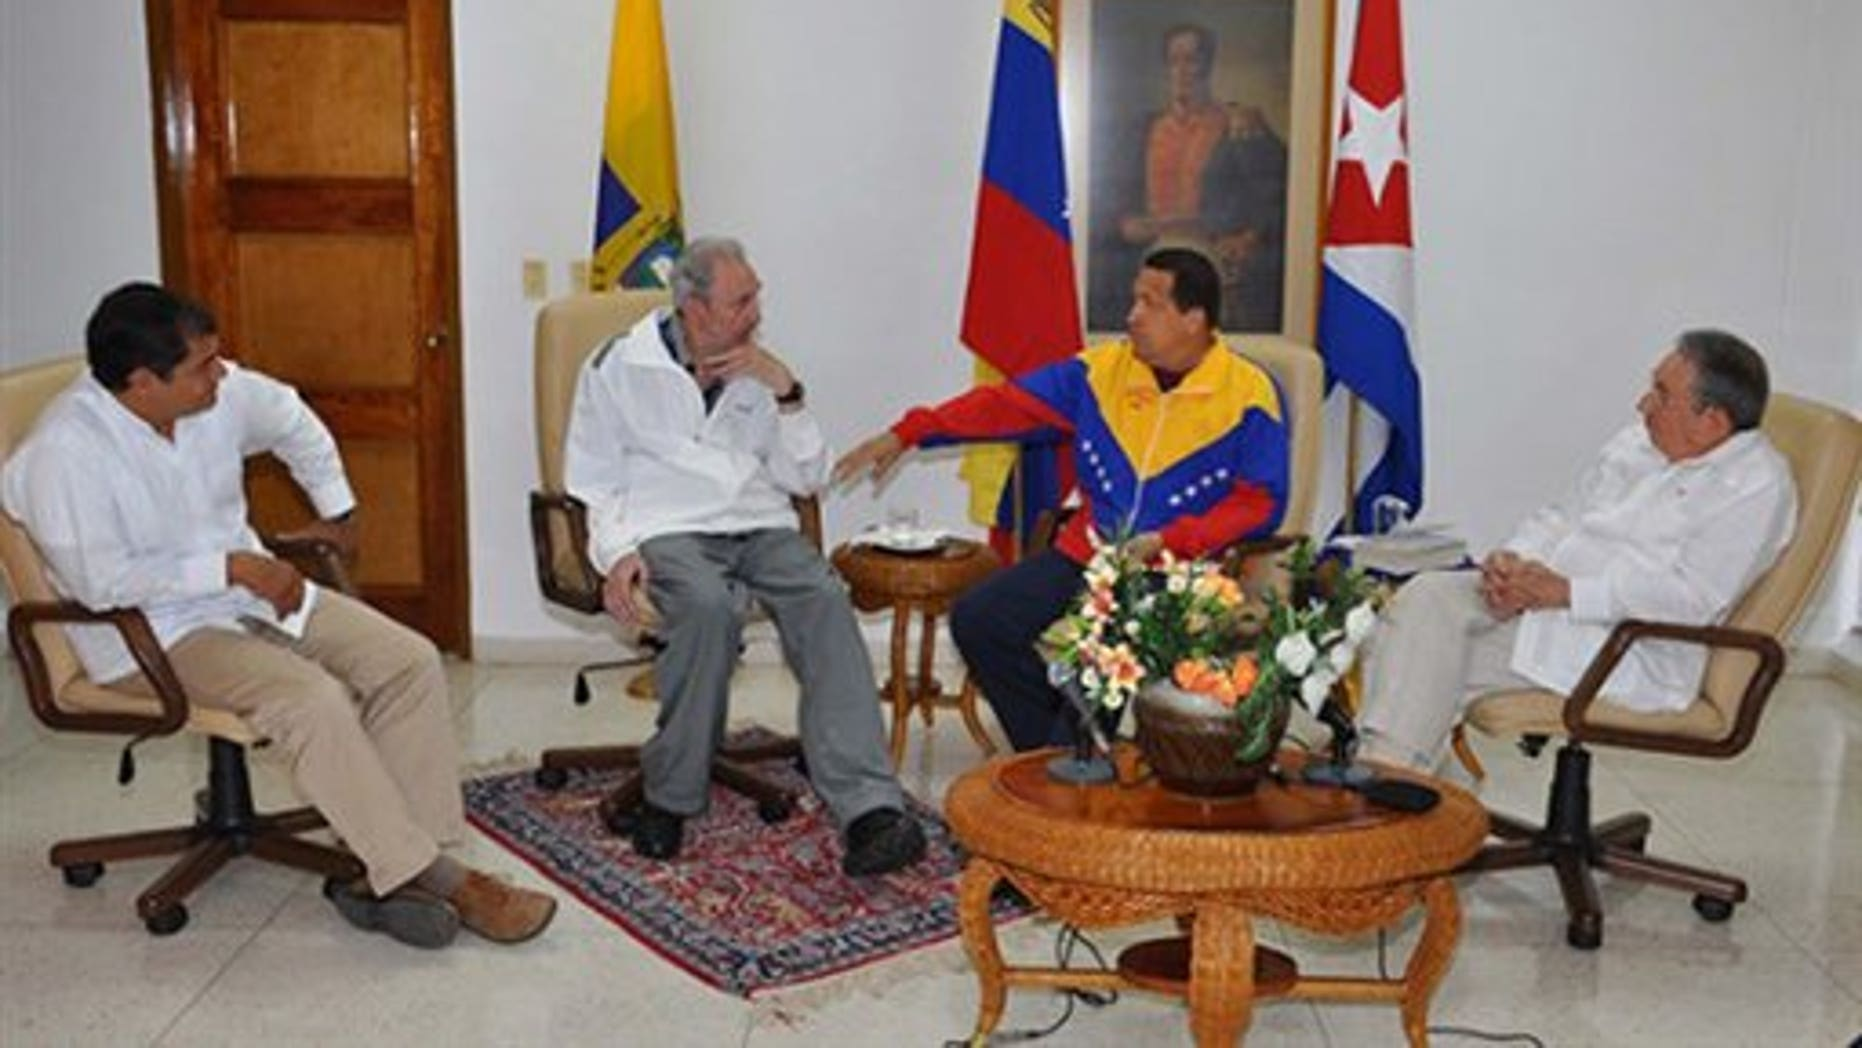 Jul 21: Photo released by Cuban government website Cubadebate. Pictured from left to right, Ecuador President Rafael Correa, Fidel Castro, Venezeulan President Hugo Chavez and Cuban President Raul Castro.